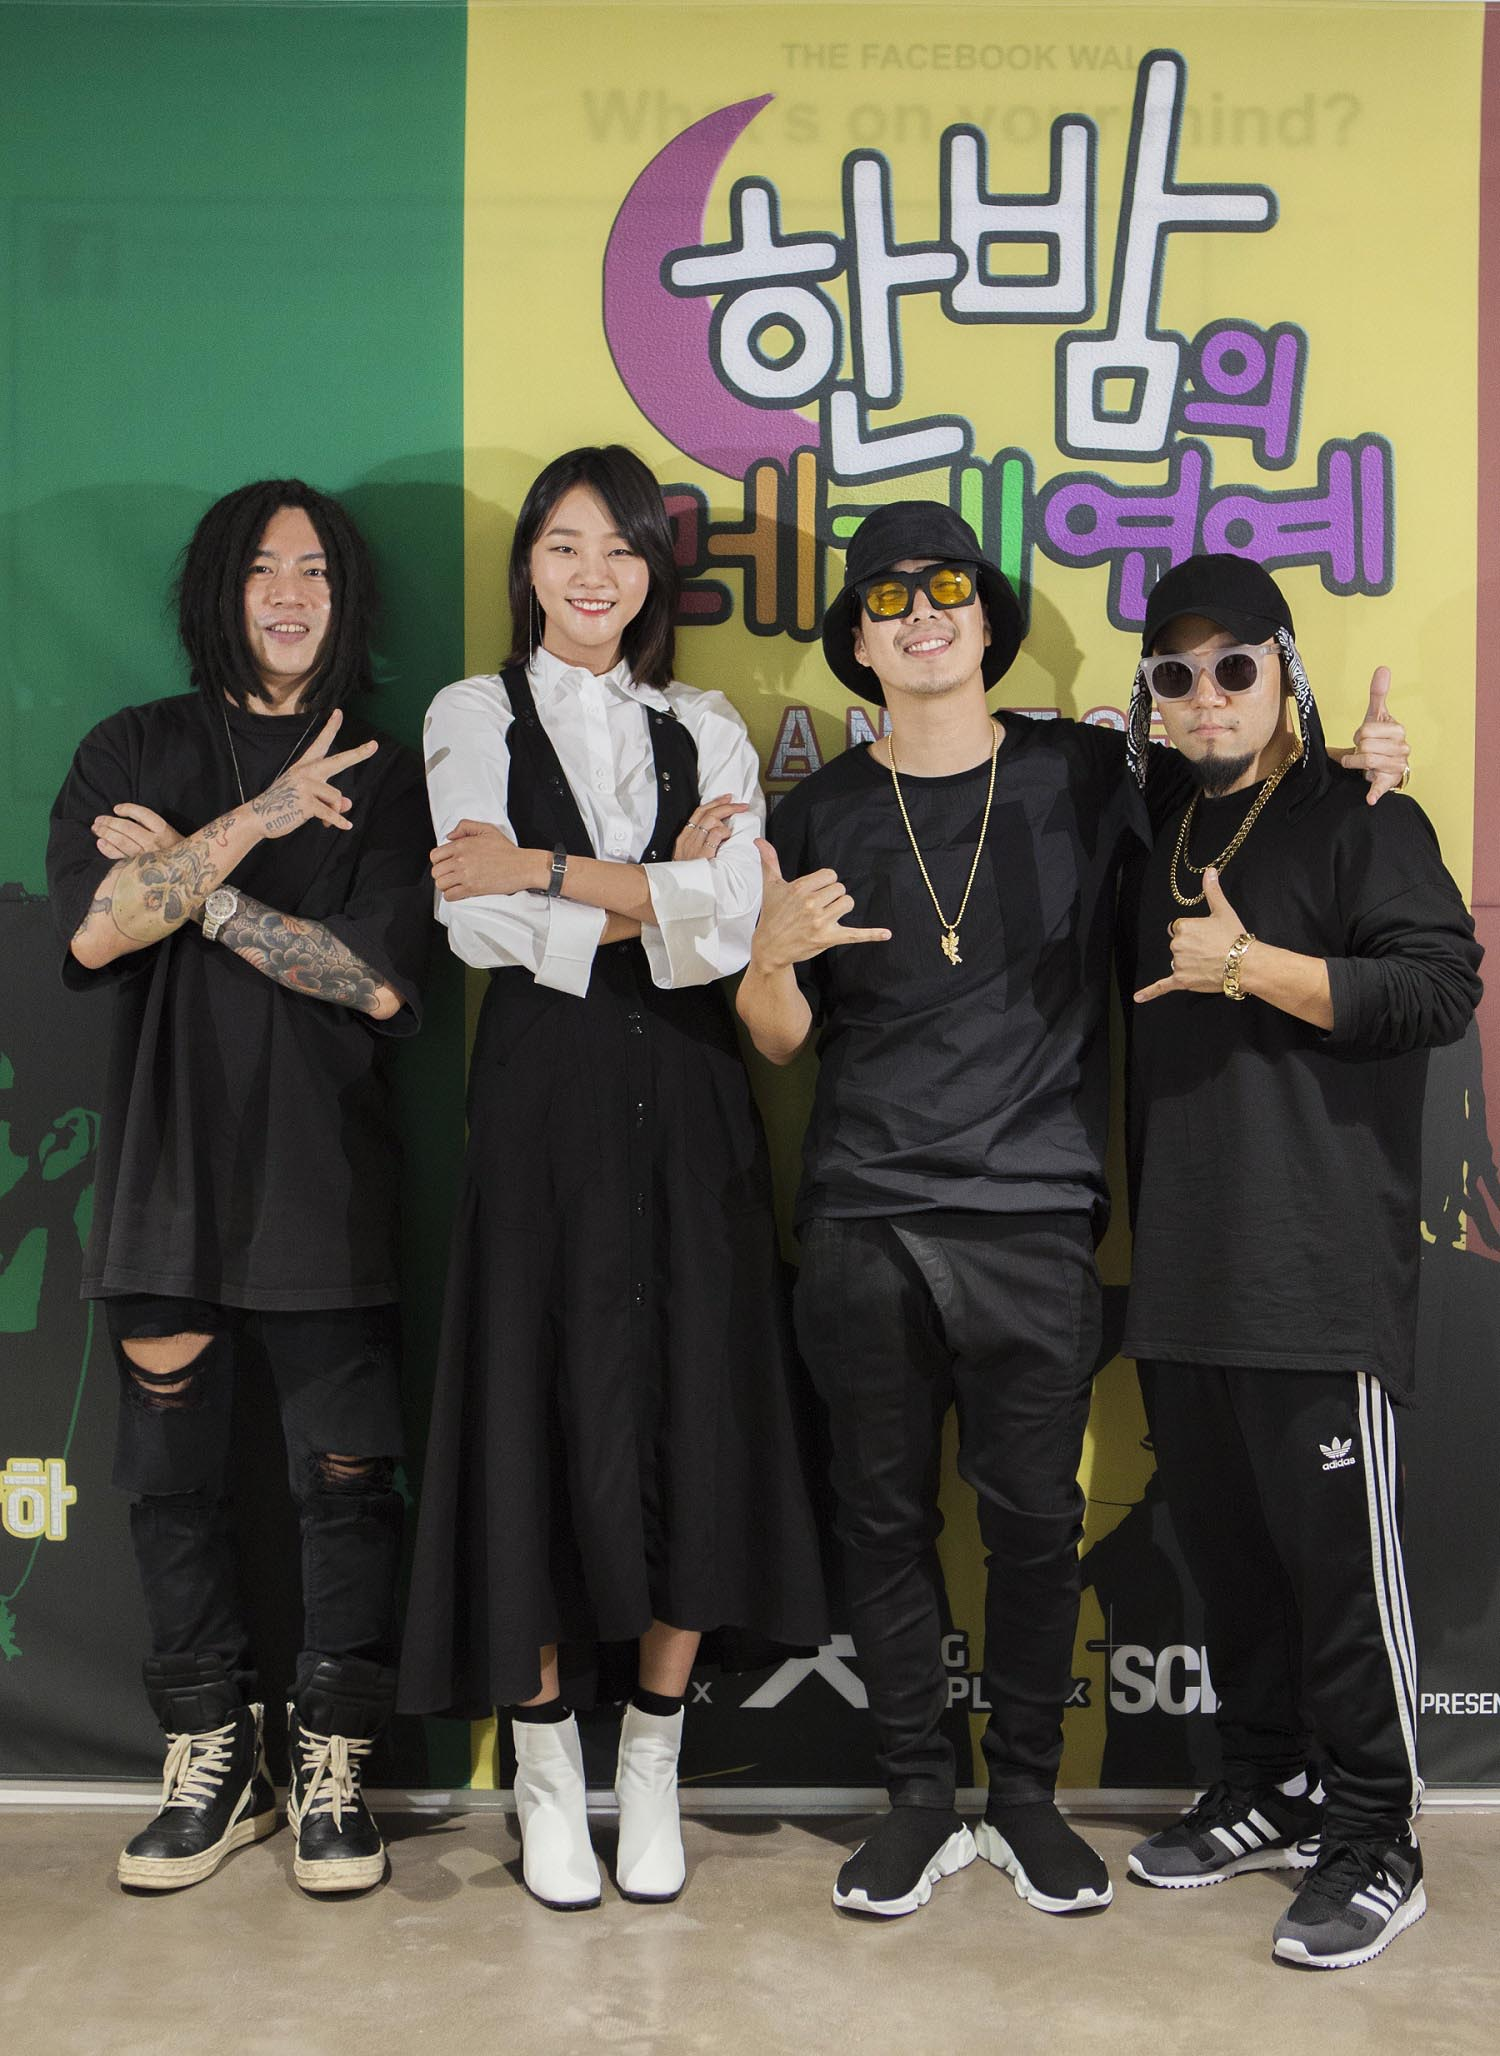 YG 케이플러스X콴엔터테인먼트, '한밤의 레게 연예' 웹예능 제작